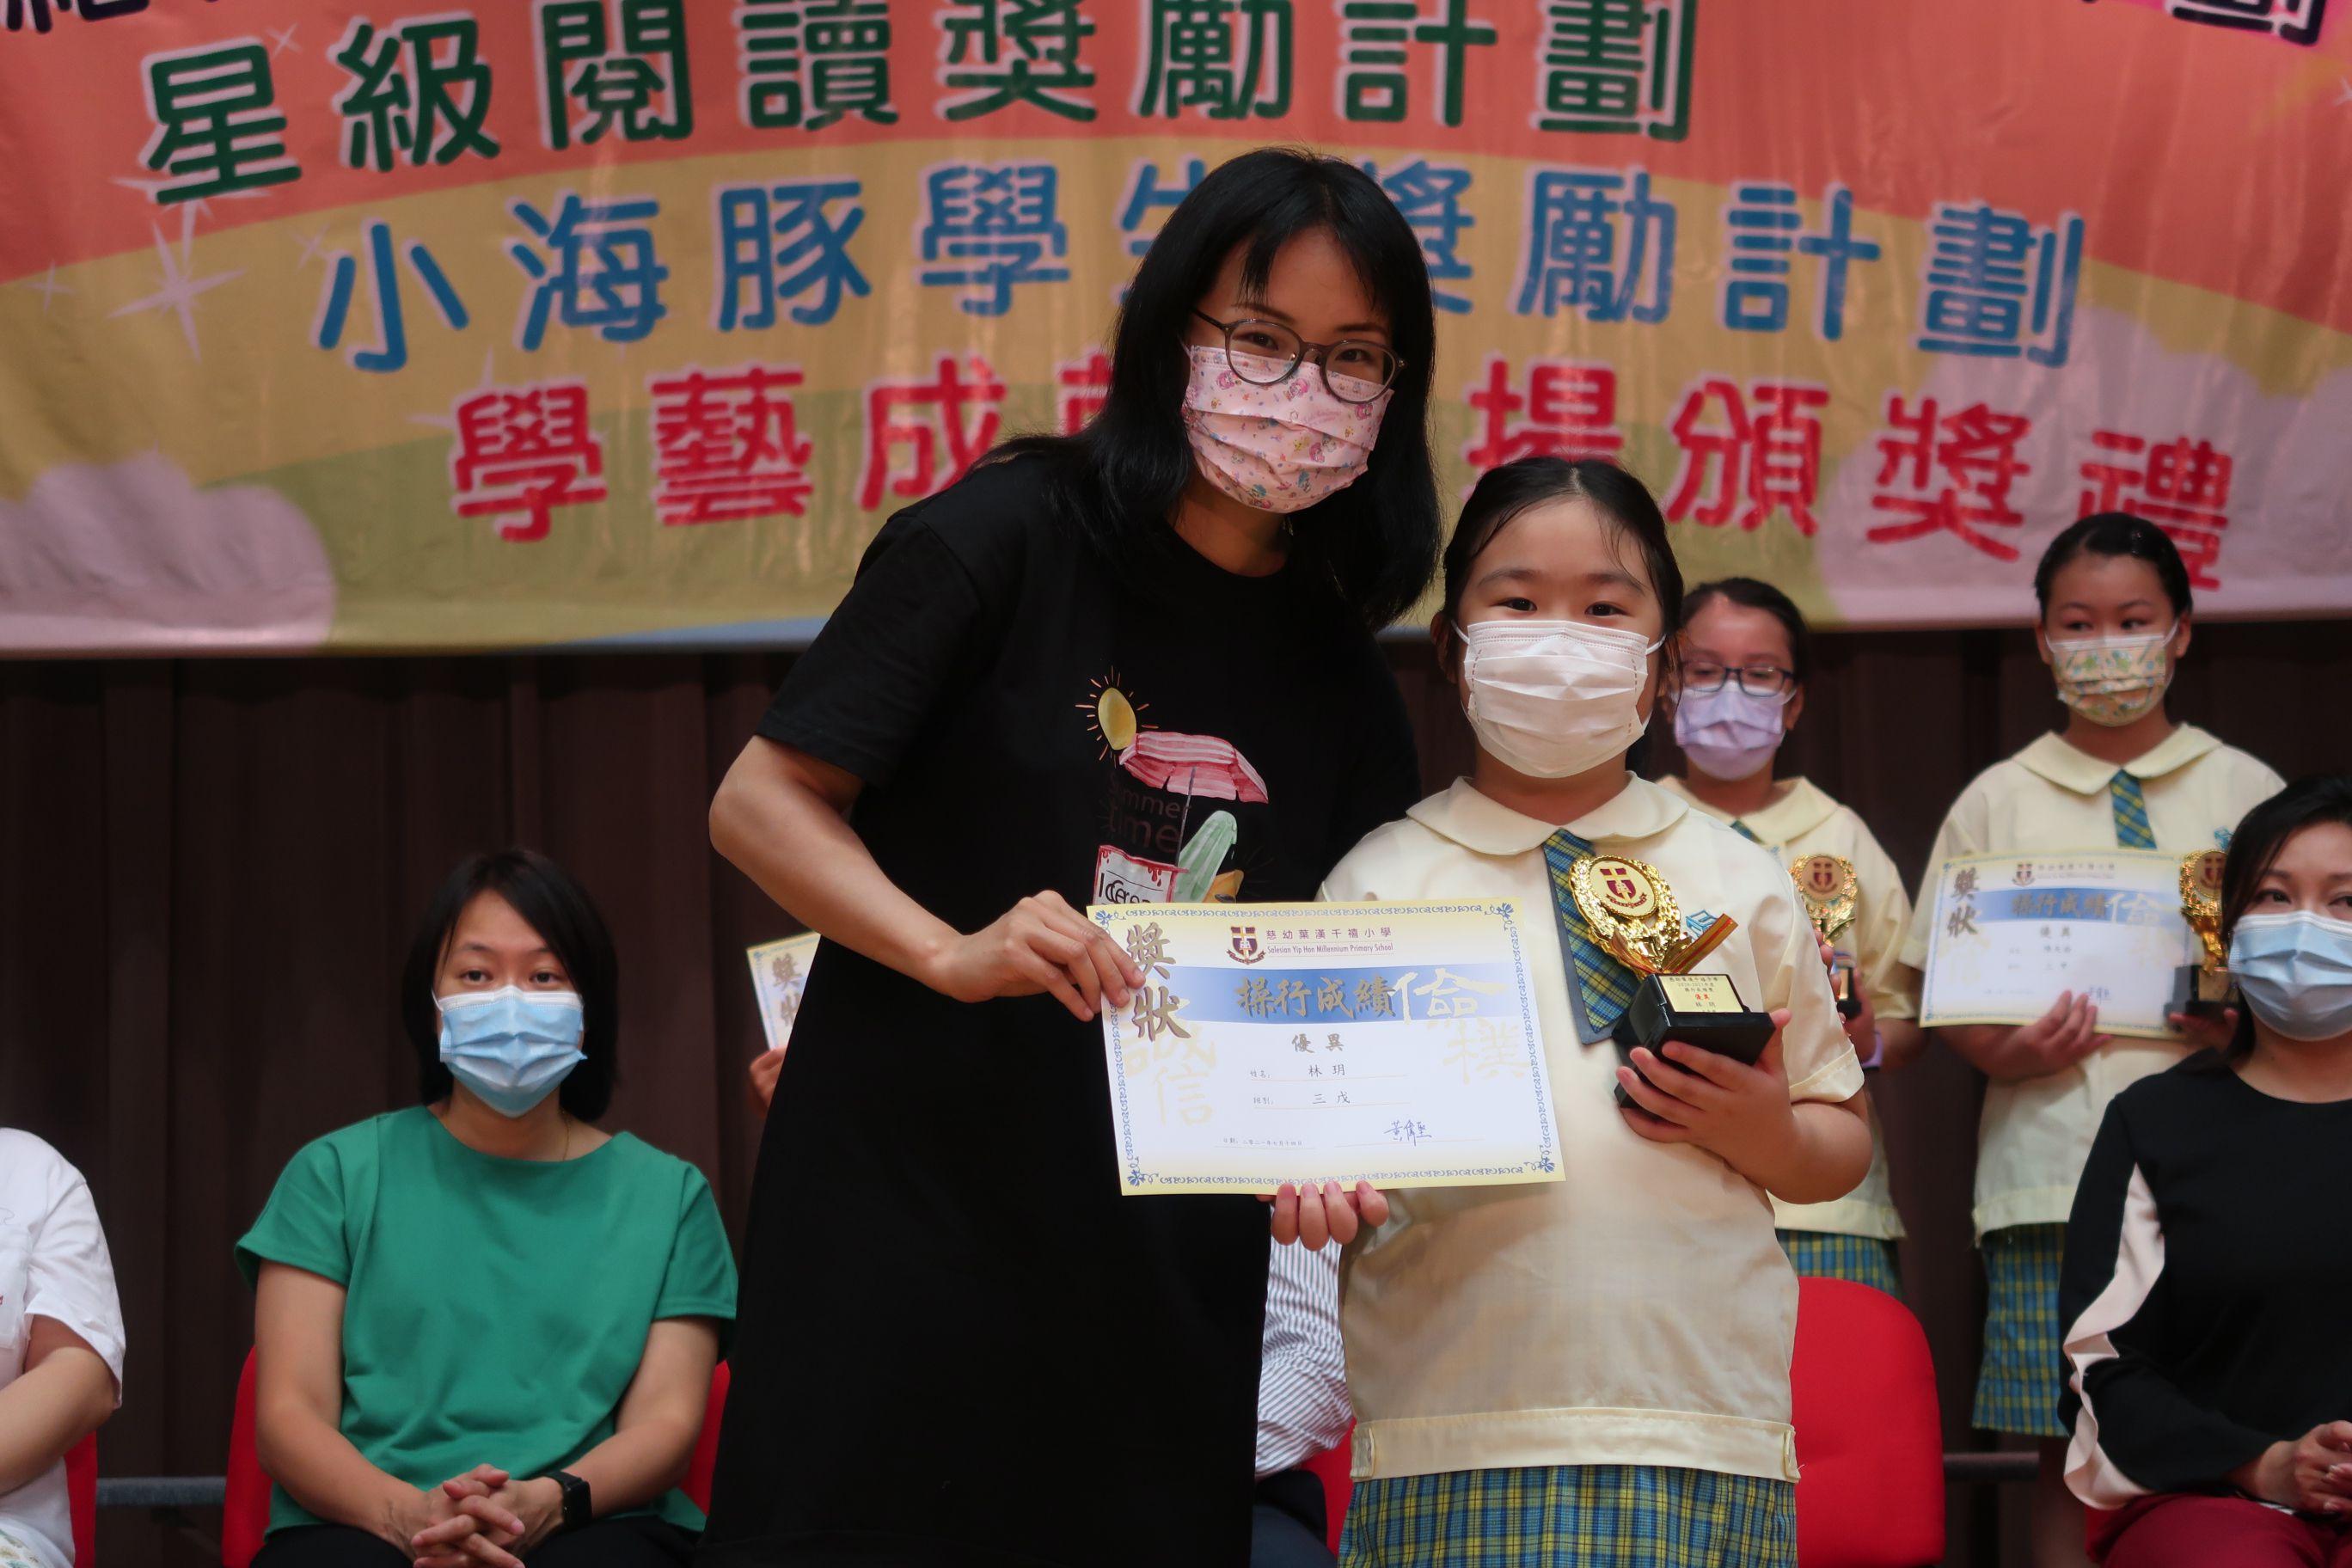 https://syh.edu.hk/sites/default/files/img_5494.jpg